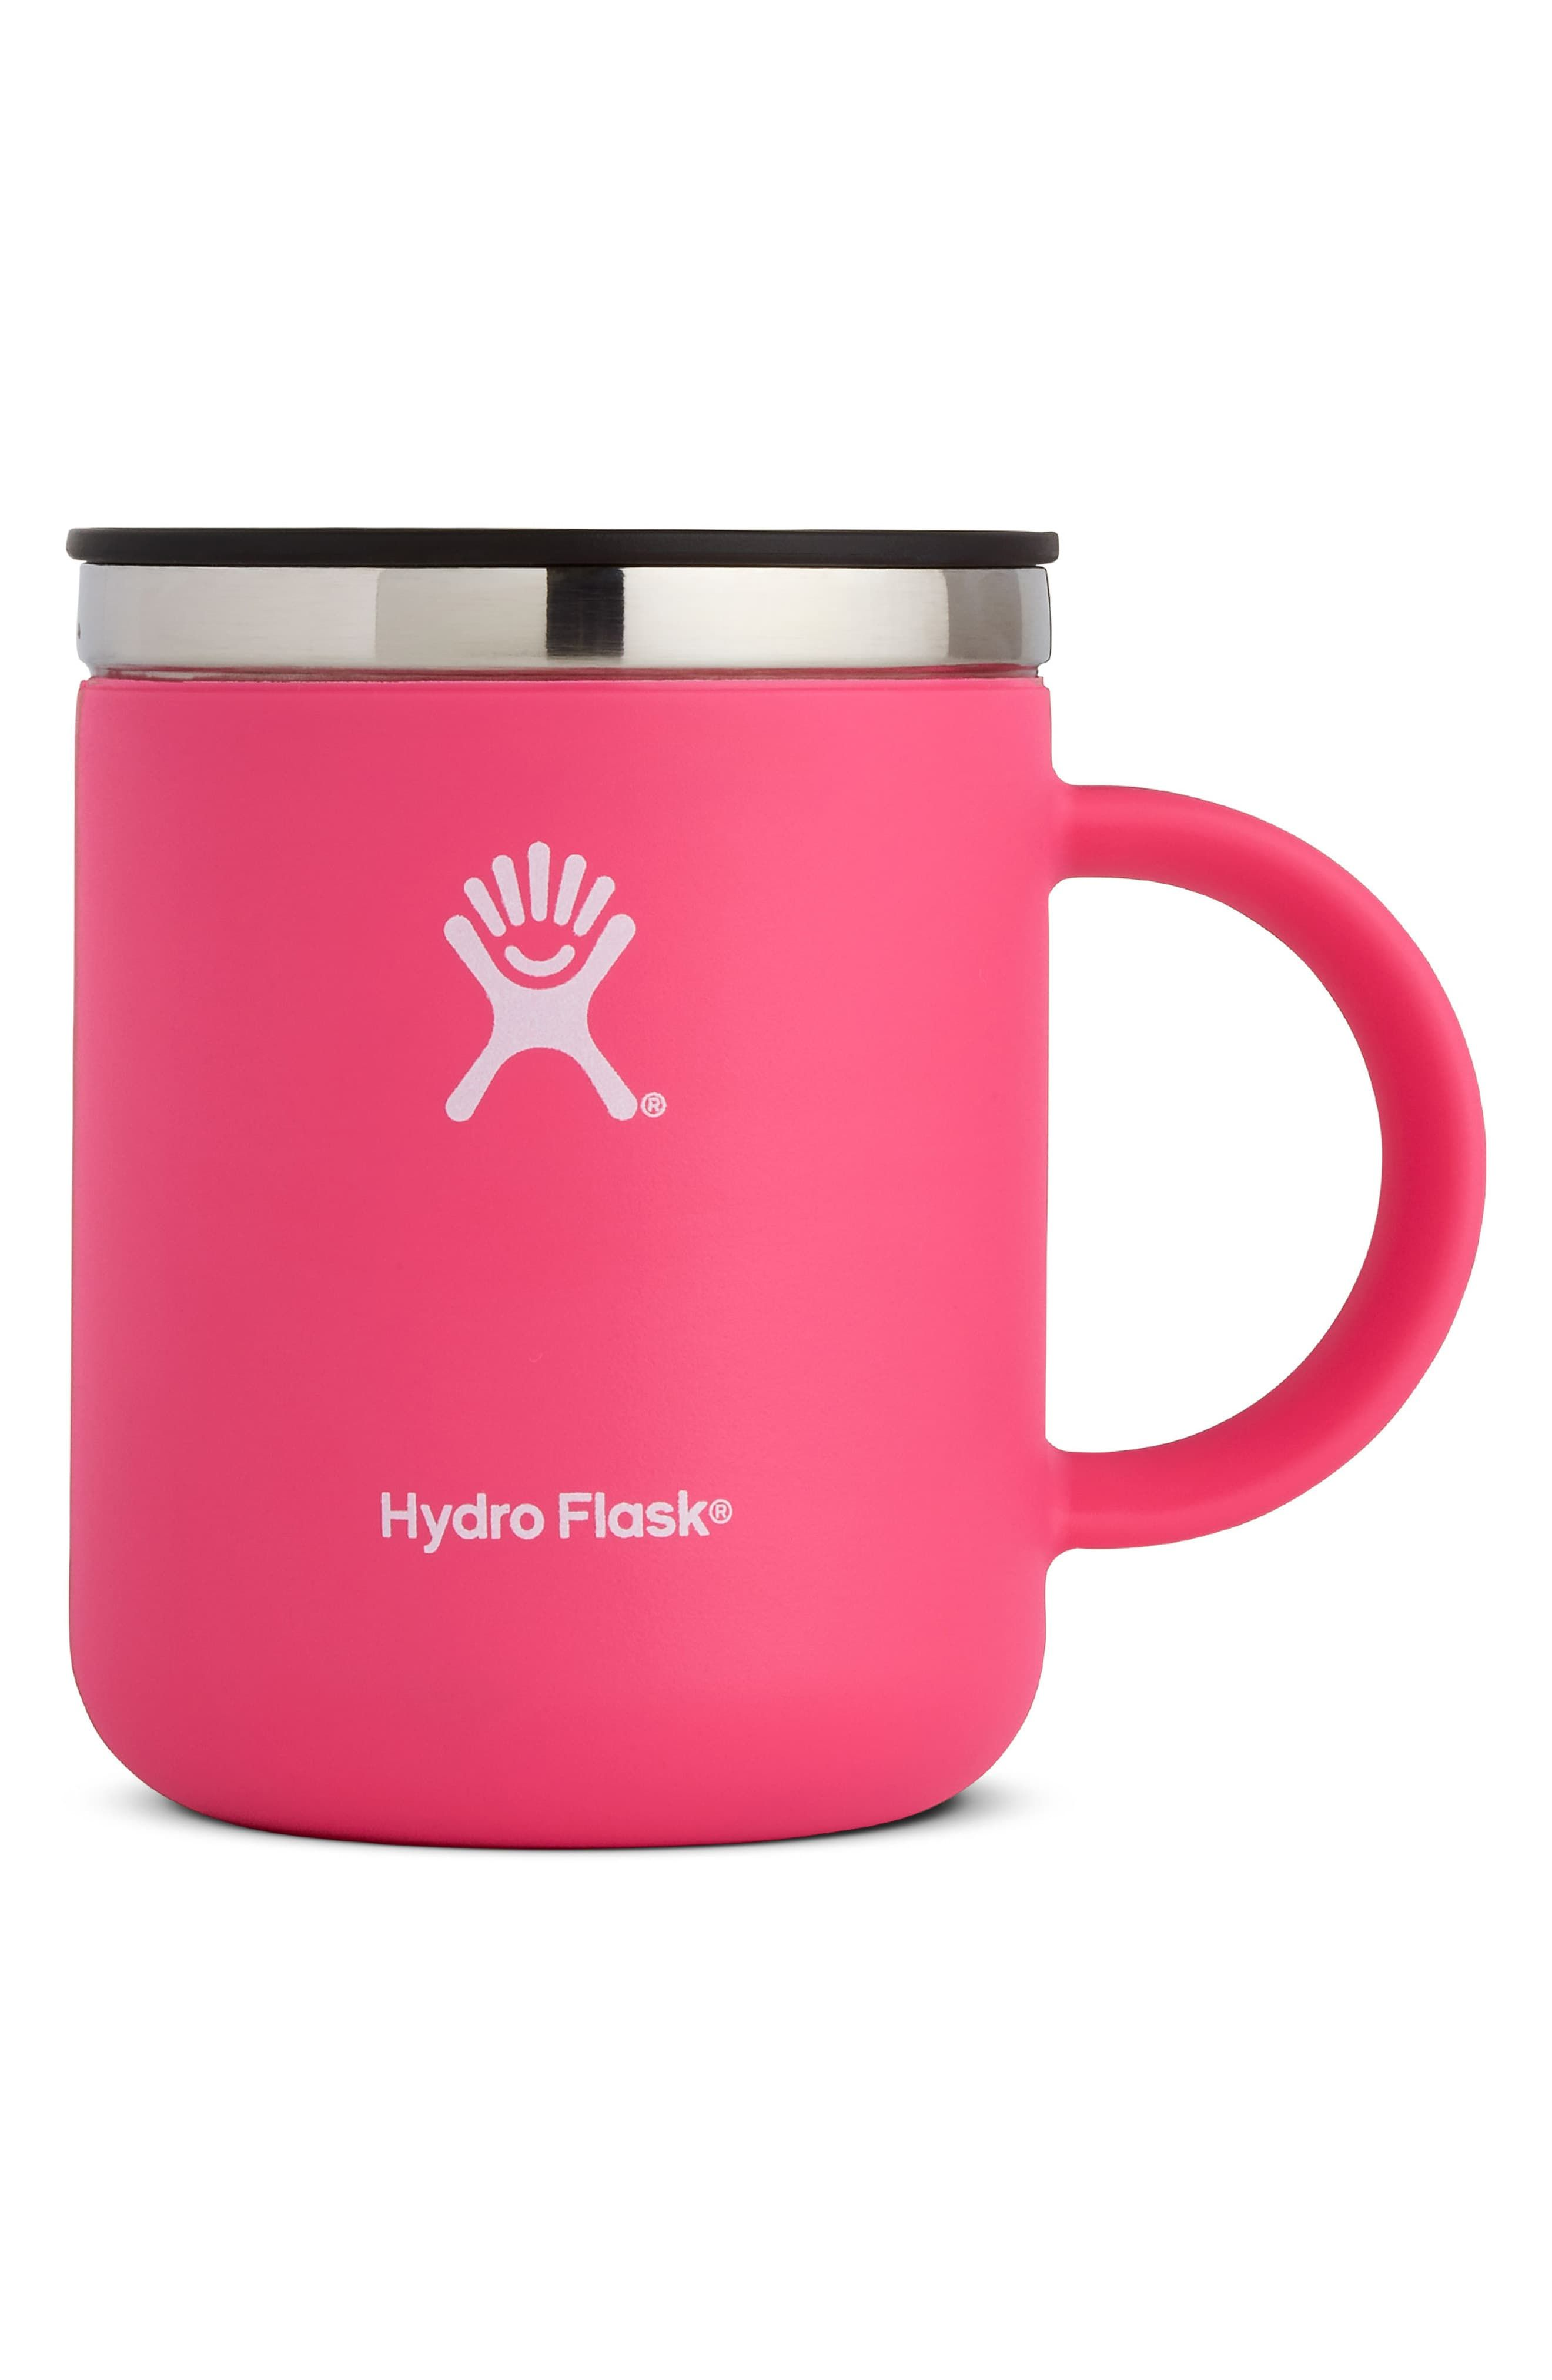 Hydro flask 12ounce coffee mug size one size pink